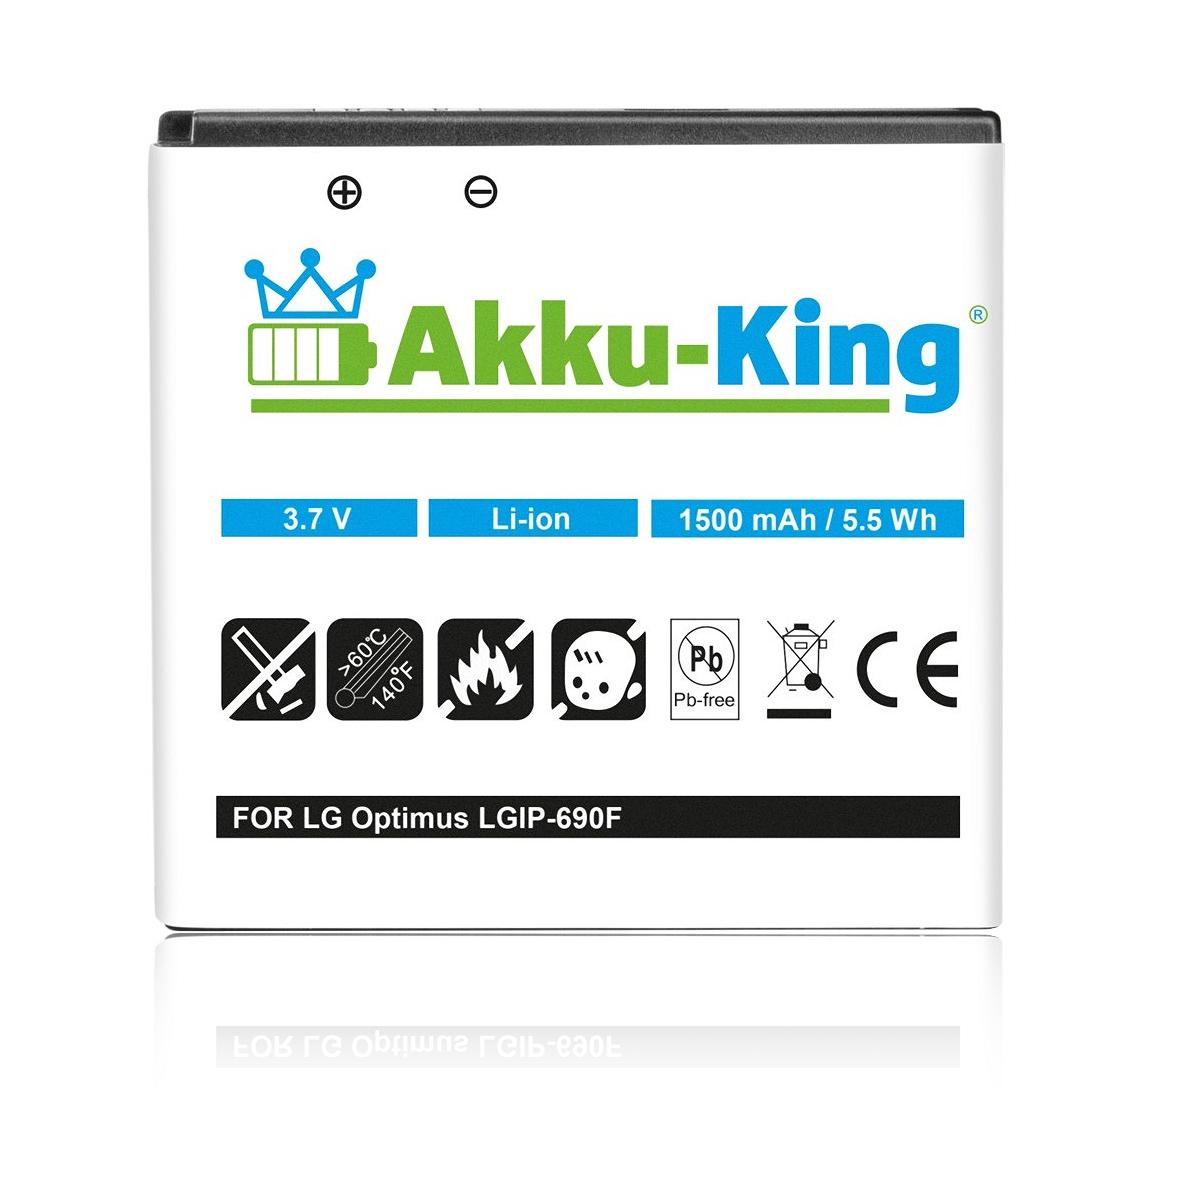 Akku-King Akku für LG Optimus 7, Optimus Quantum und C900 ...